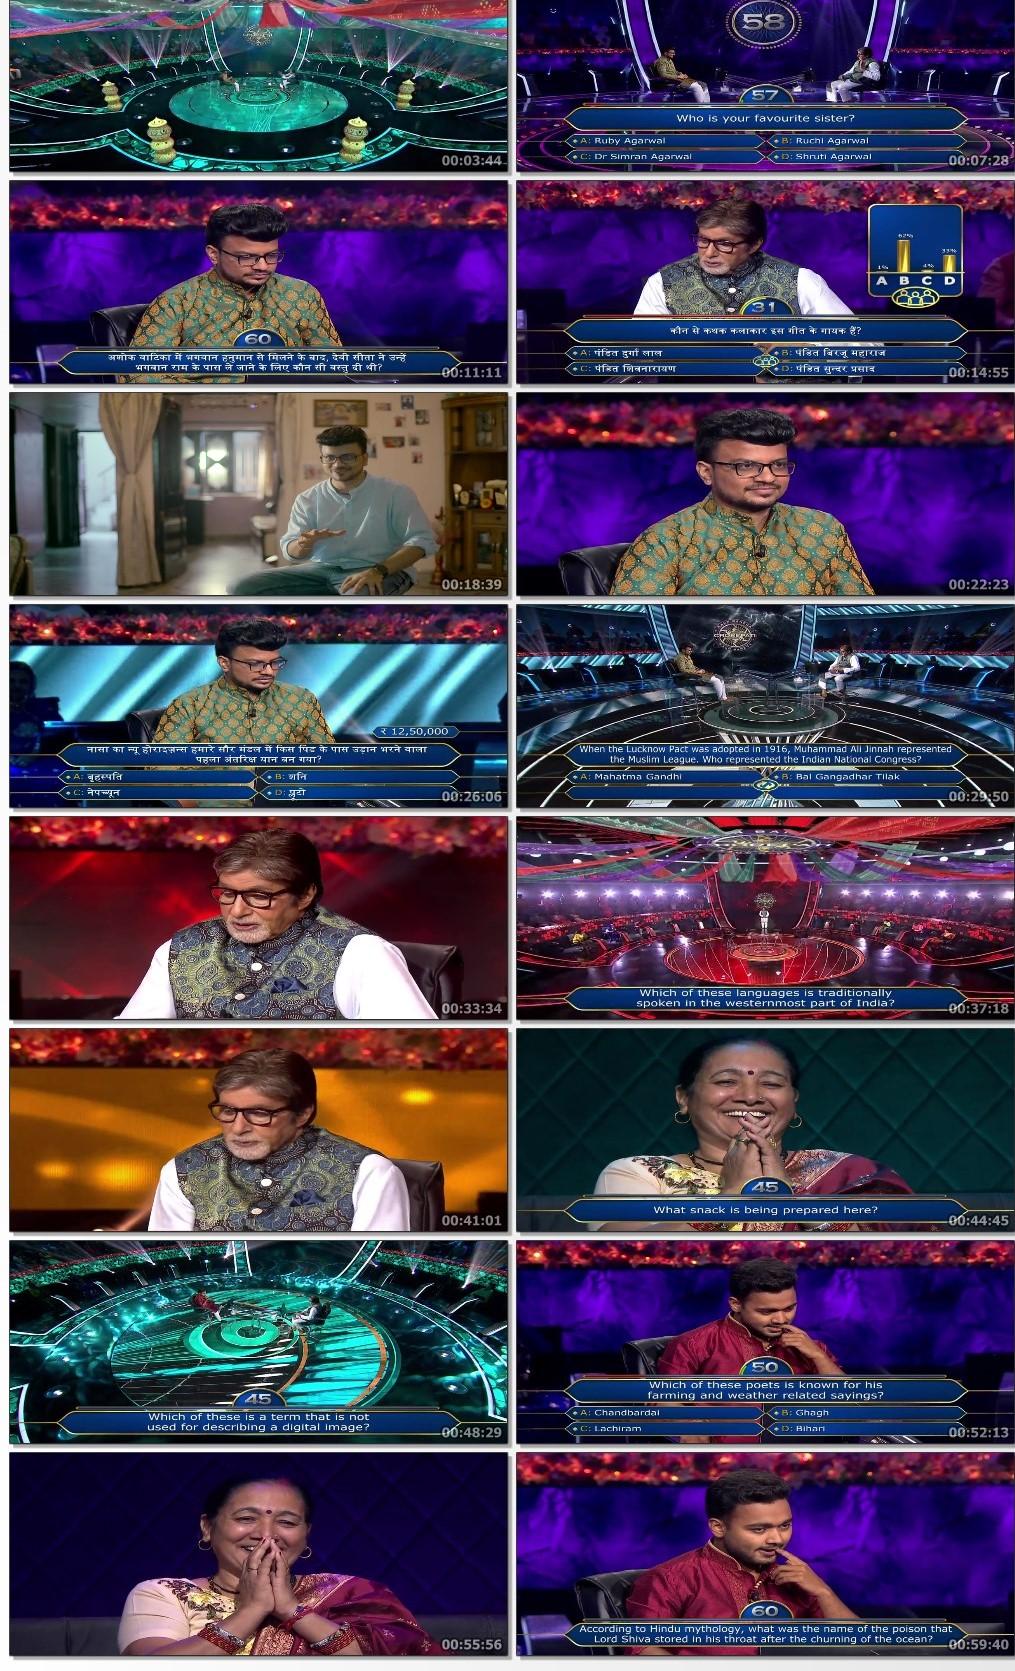 Kaun-Banega-Crorepati-2021-S13-E38-Hindi-www-9kmovies-work-720p-HDRip-450-MB-mkv-thumbs769b99f55677d